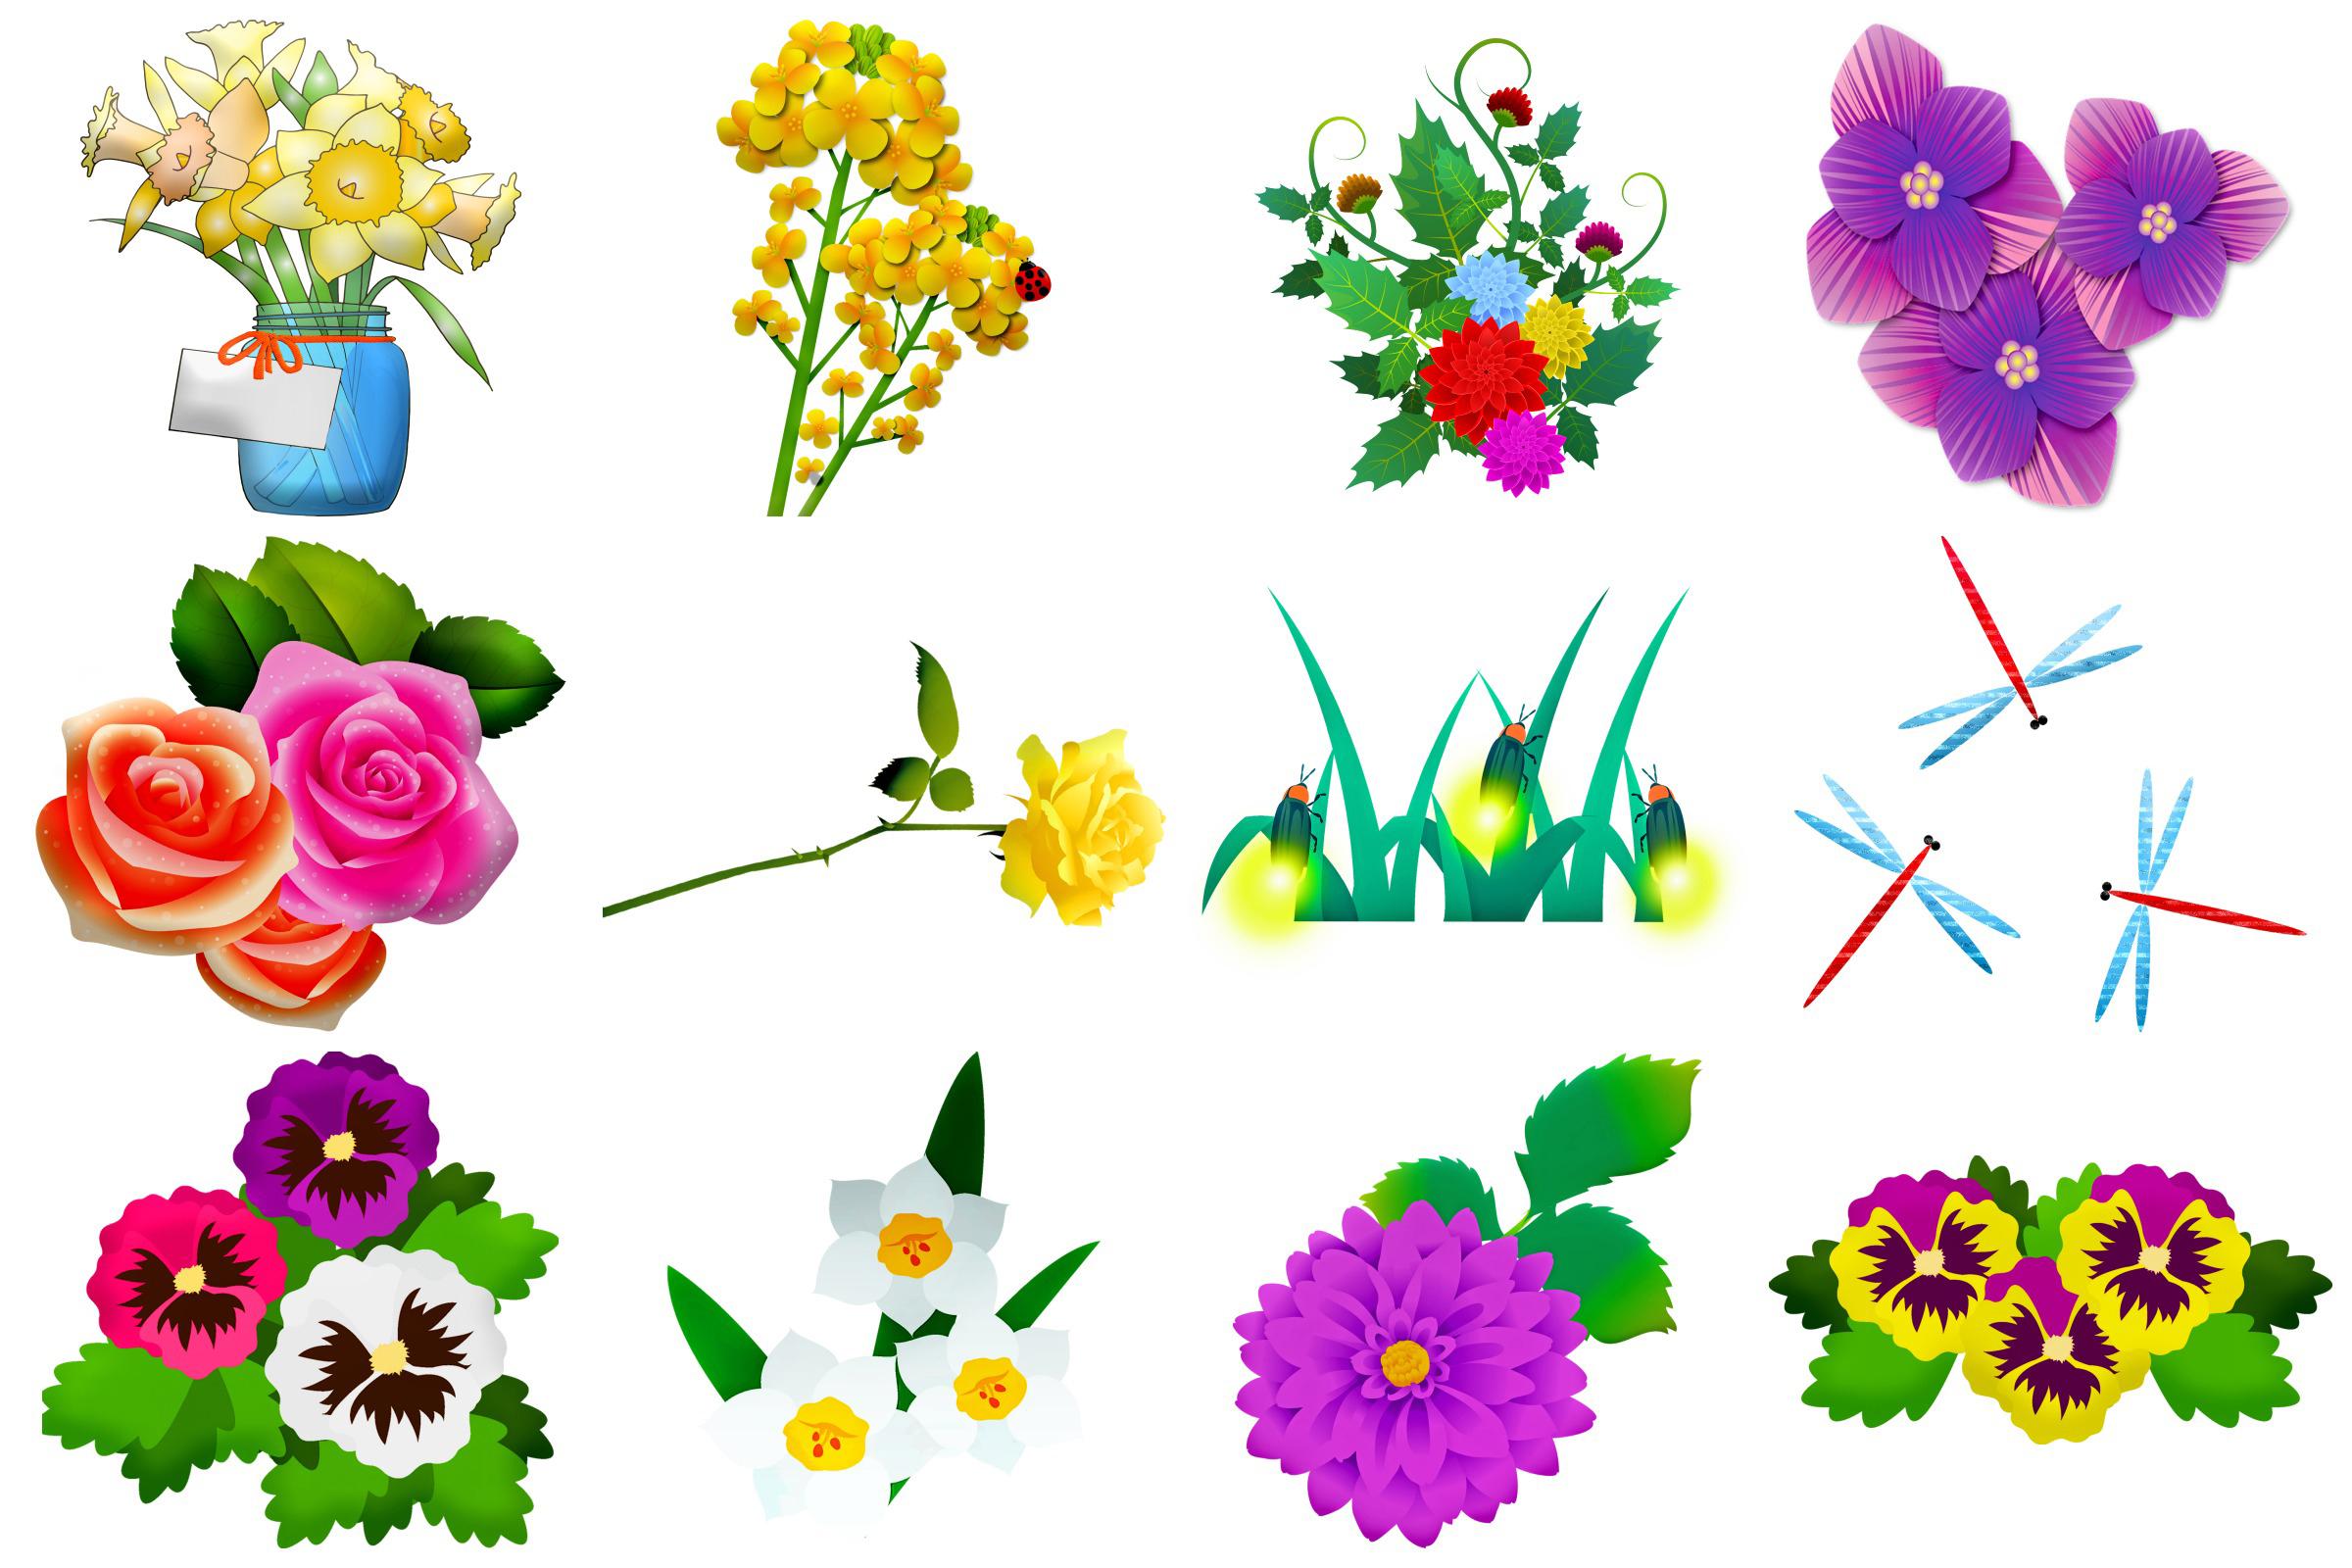 Summer Florals & Elements Clip Art example image 2